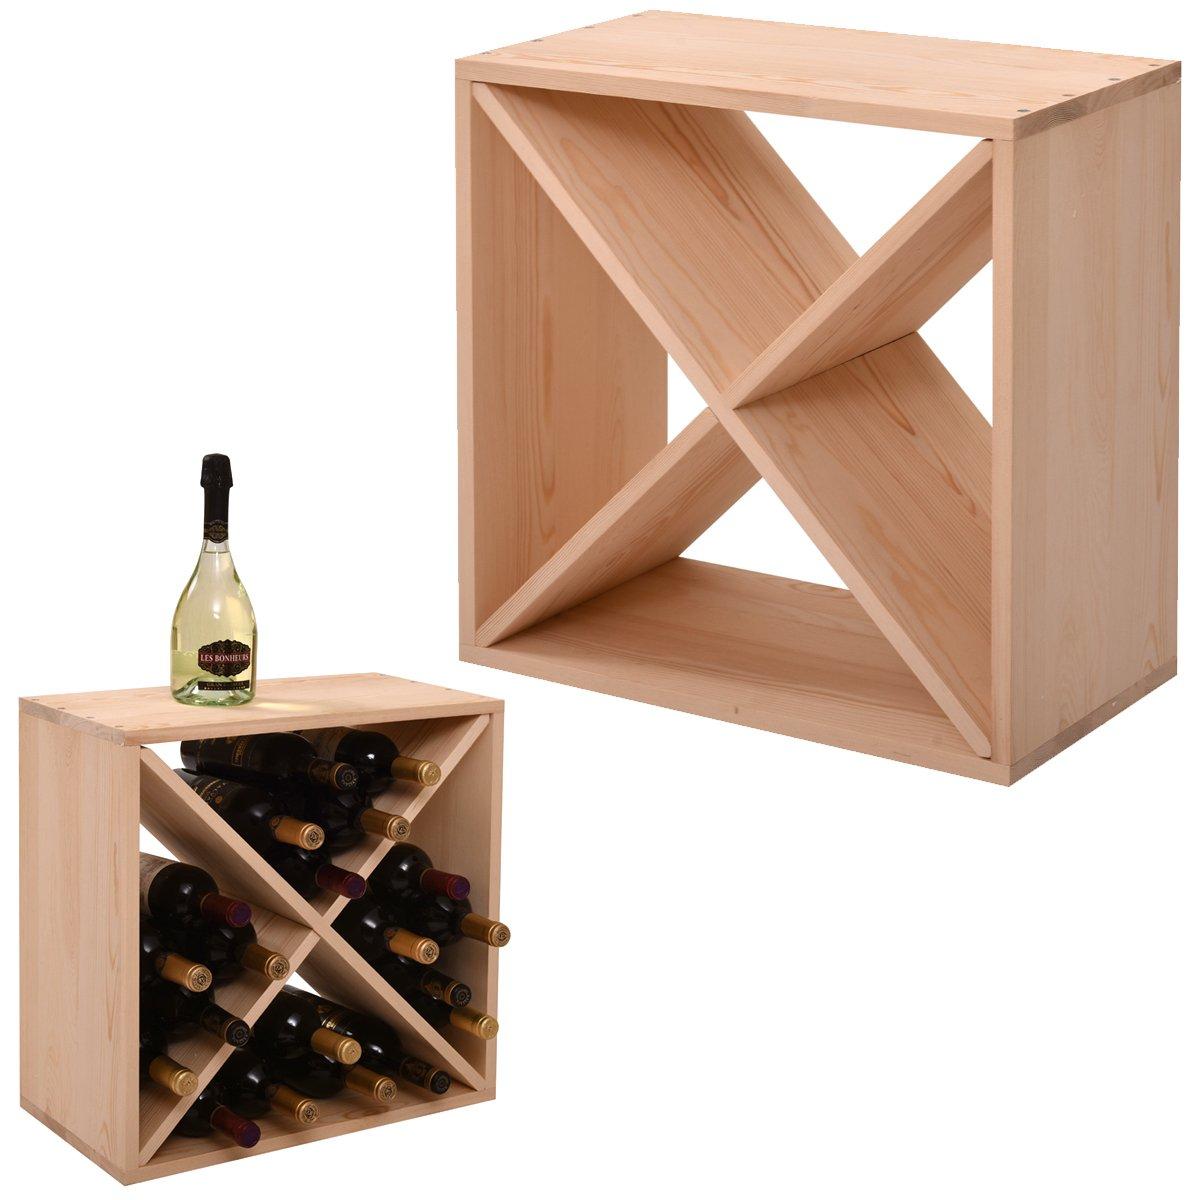 JAXPETY 24 Bottle Wine Rack Holder Compact Cellar Cube Bar Storage Kitchen Decor Wood Display Home,Natural